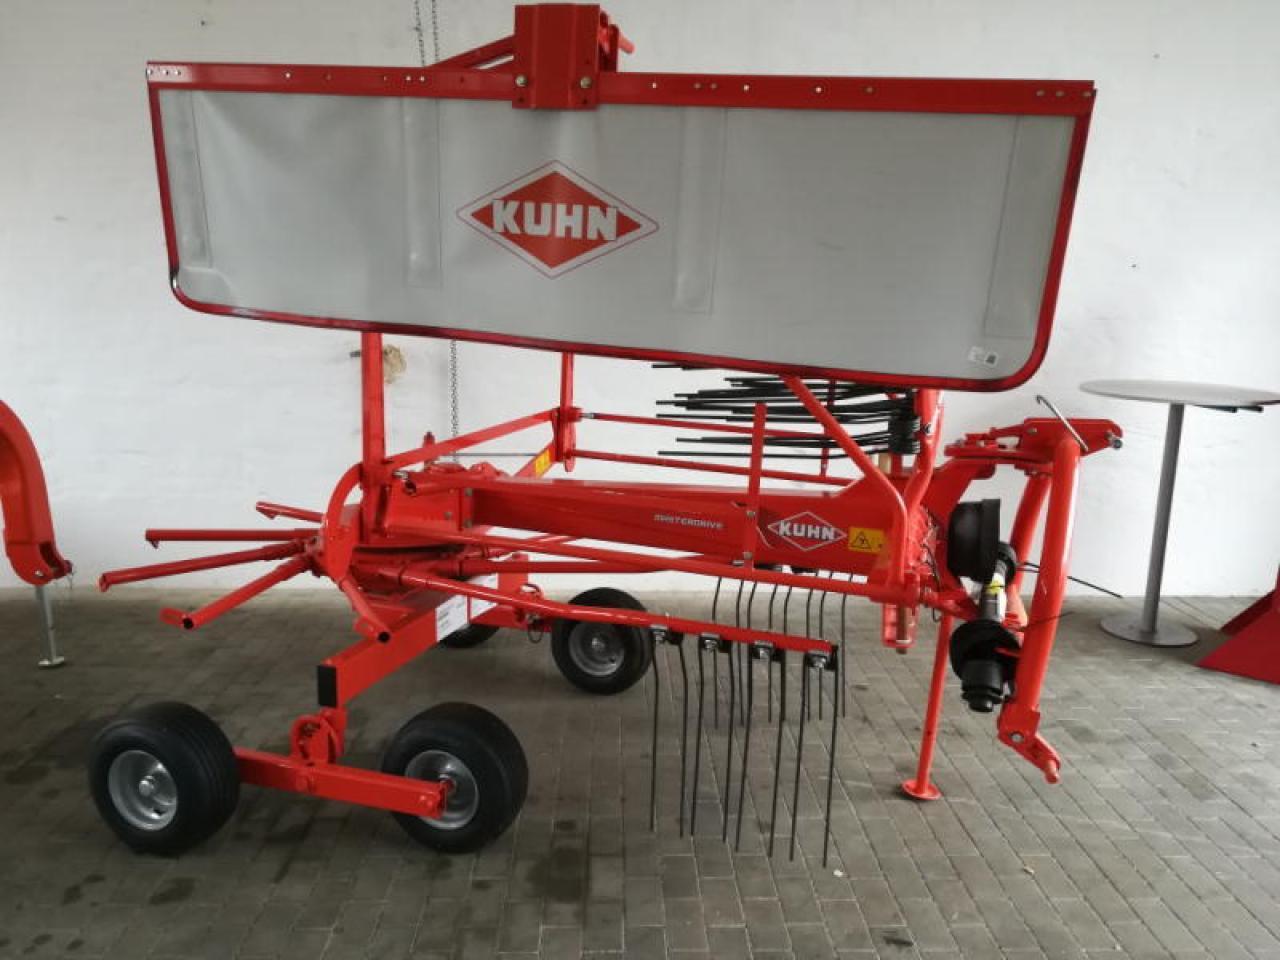 Kuhn GA 4121 GM